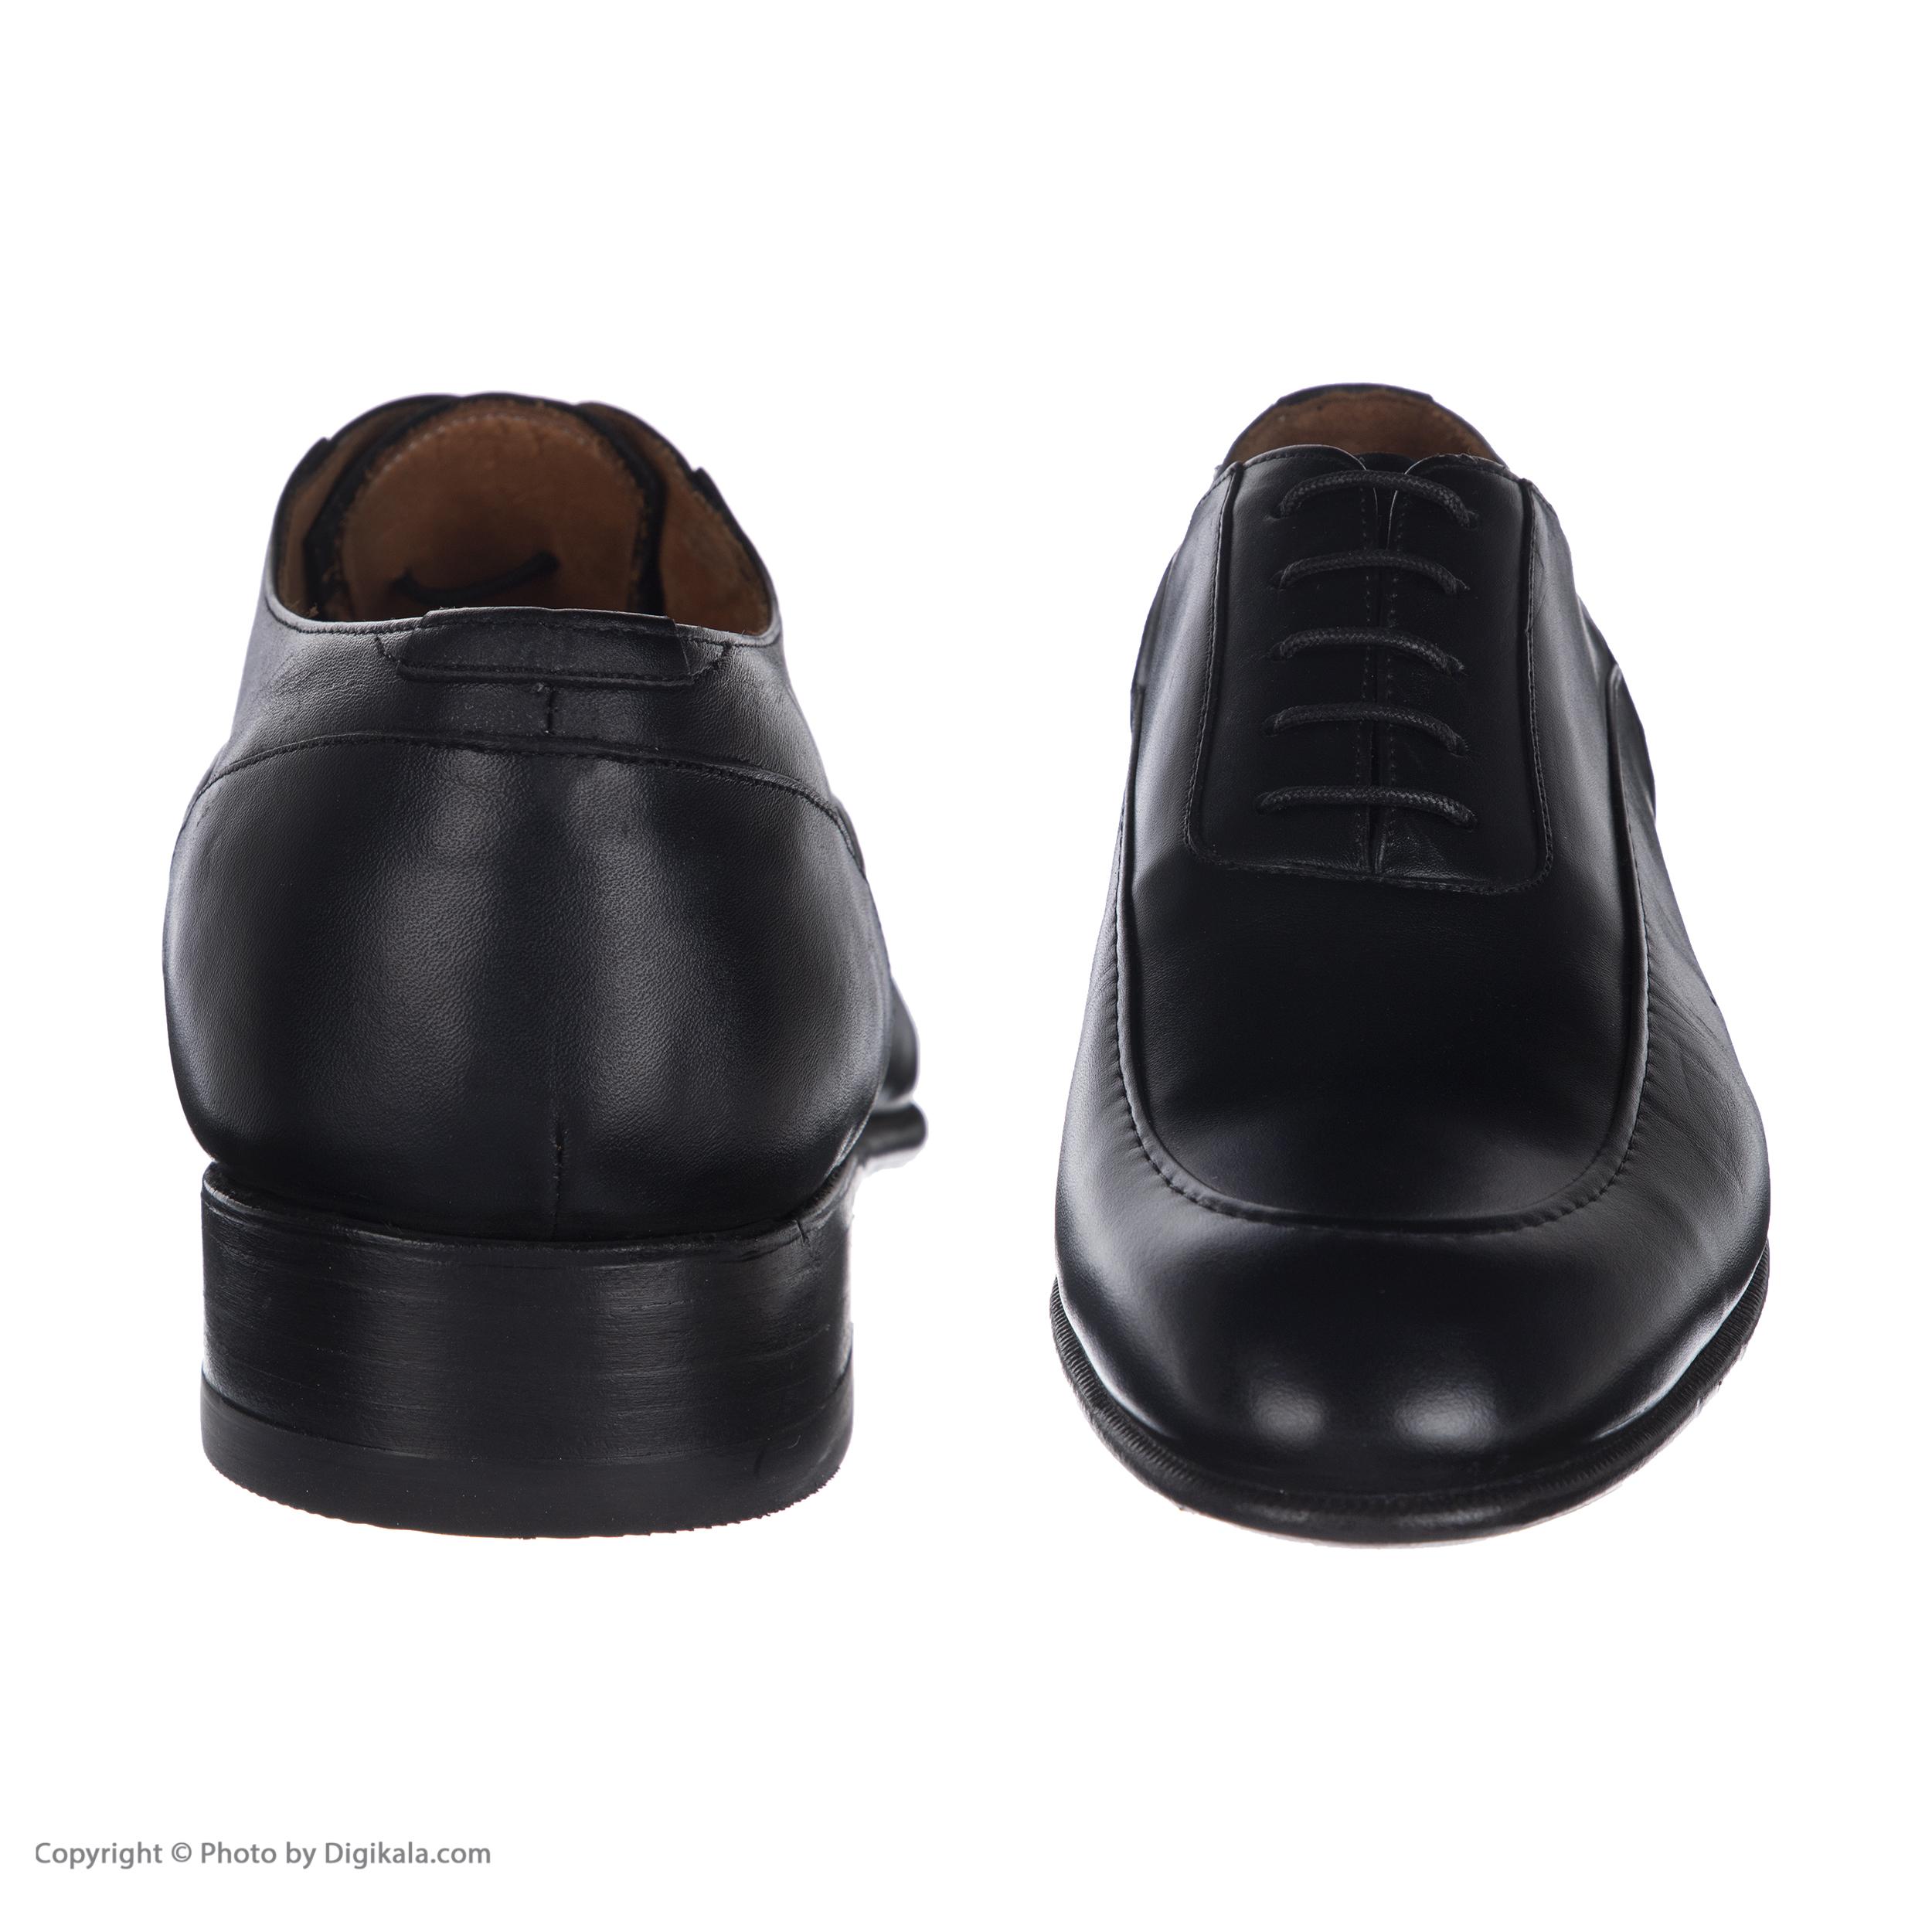 کفش مردانه نظری کد 425 -  - 3